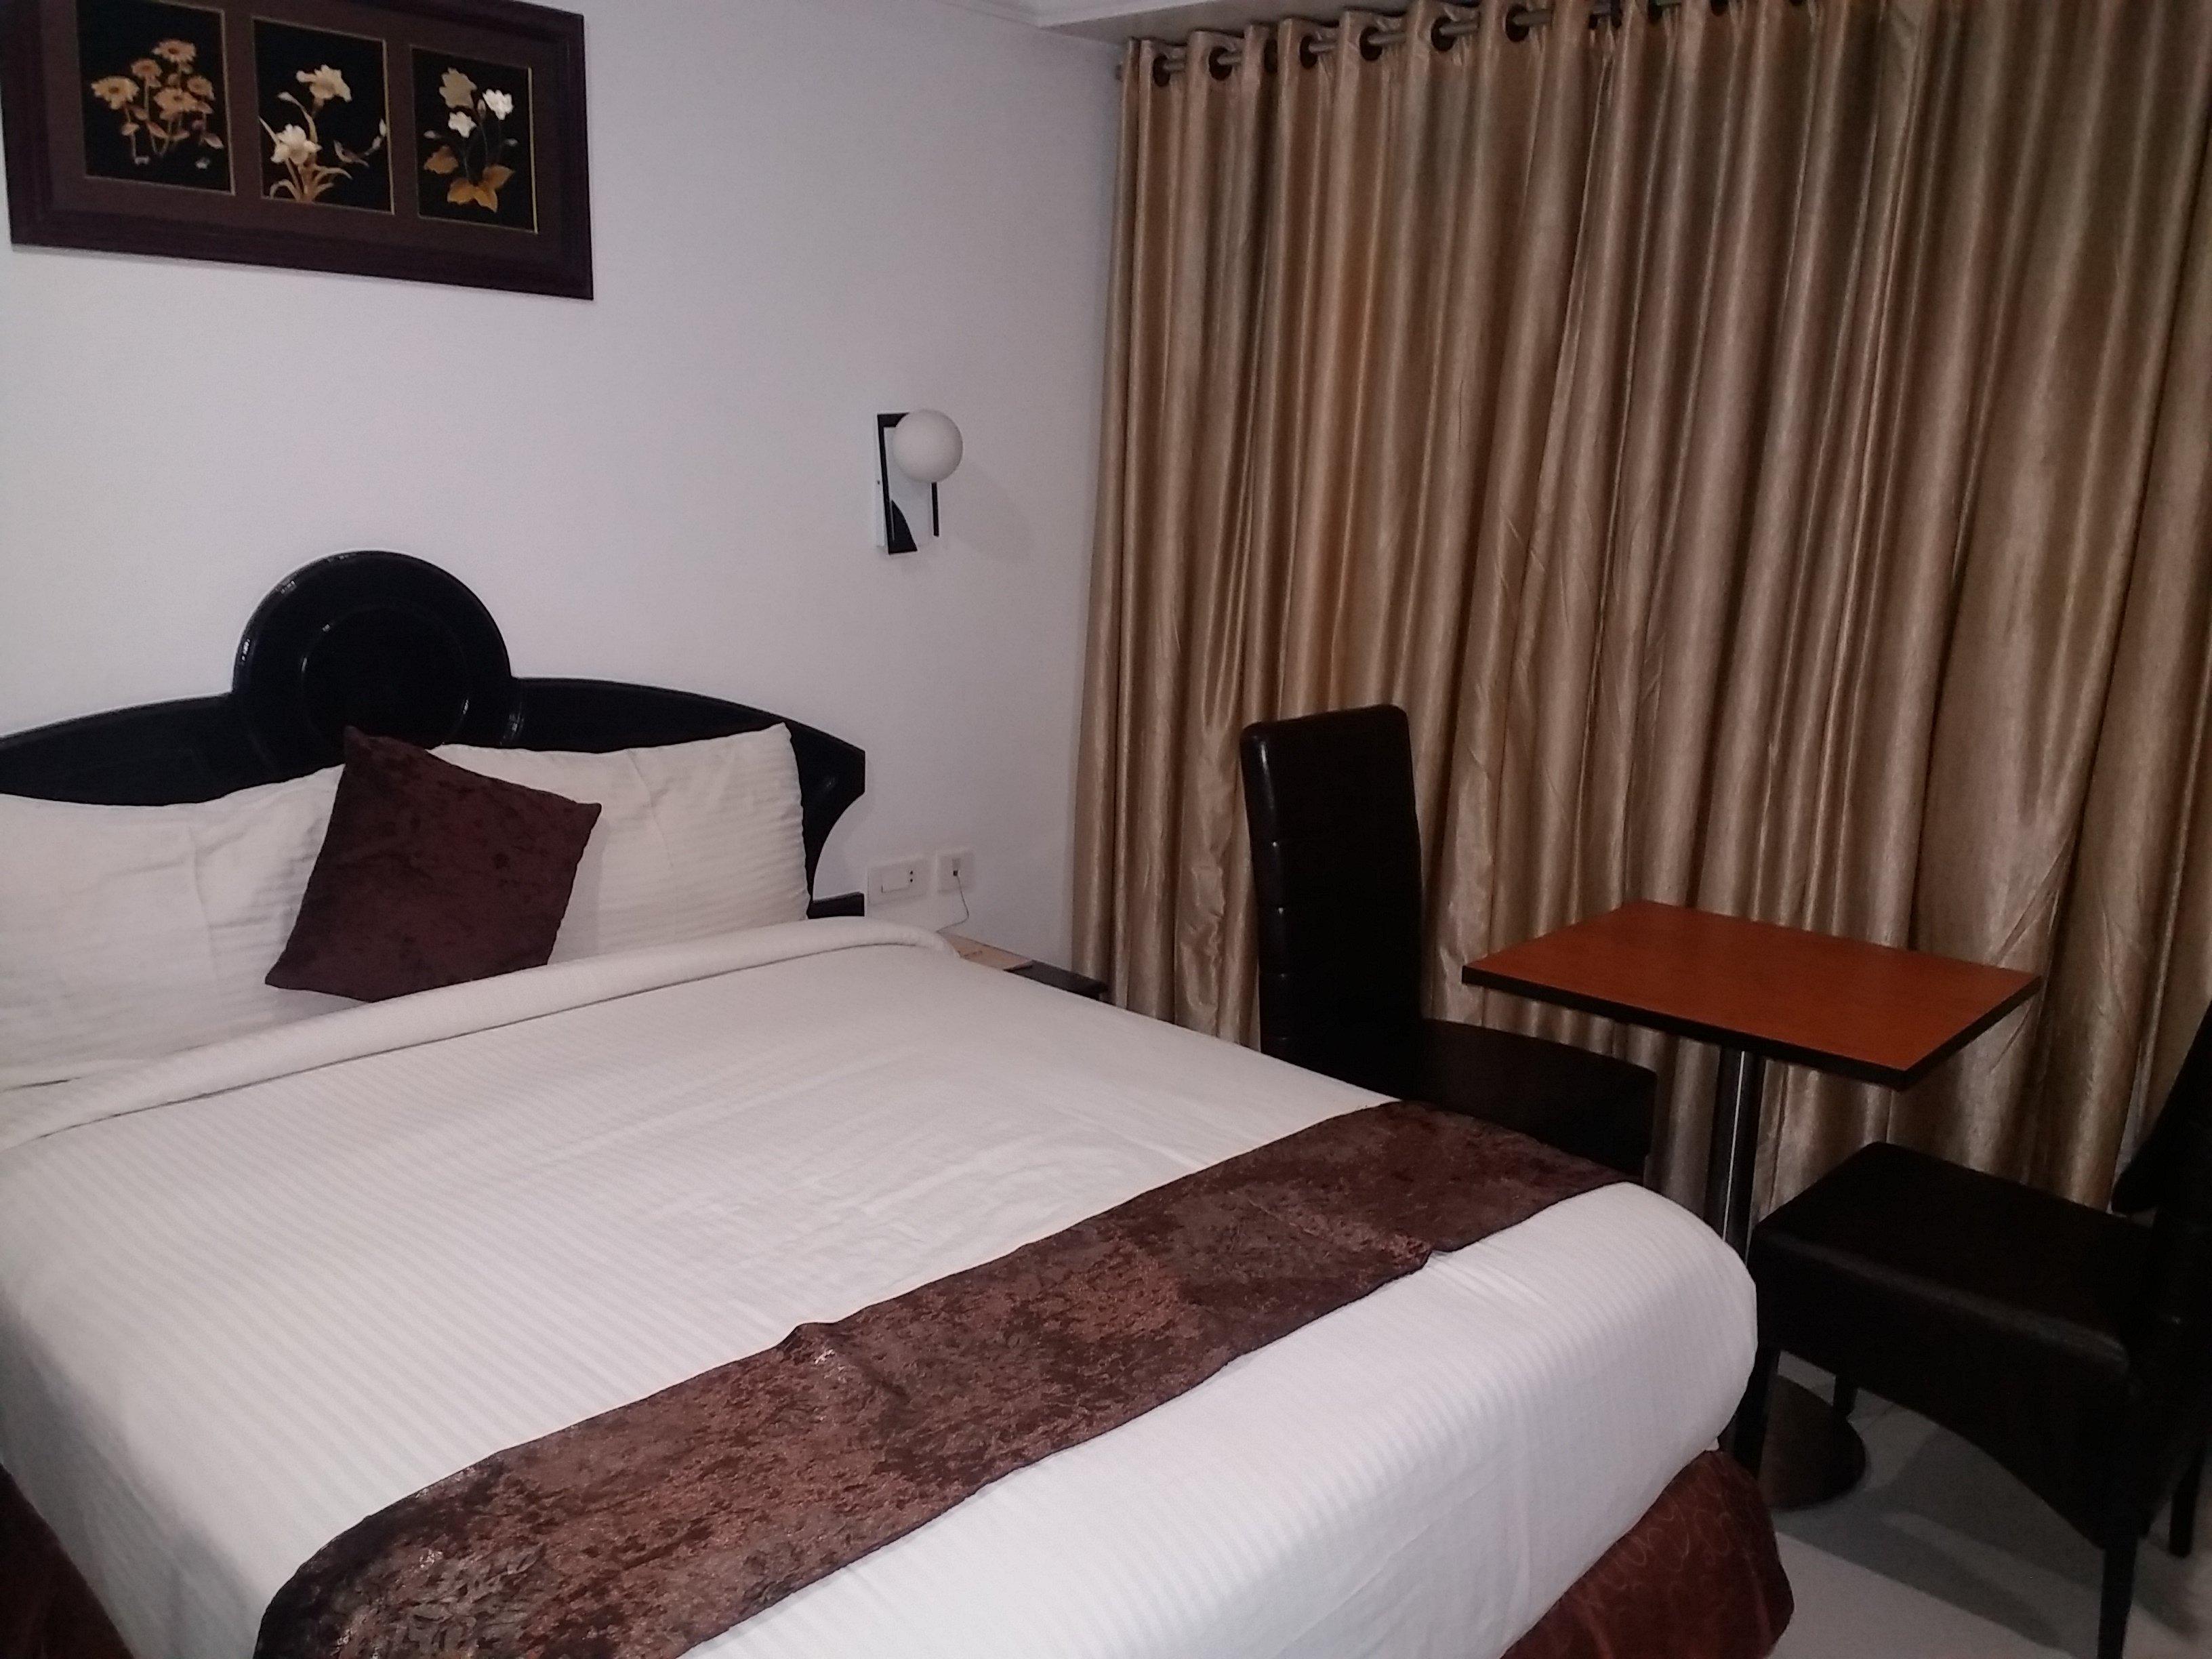 Hotel Gago Inn Kerala India Reviews s & Price parison